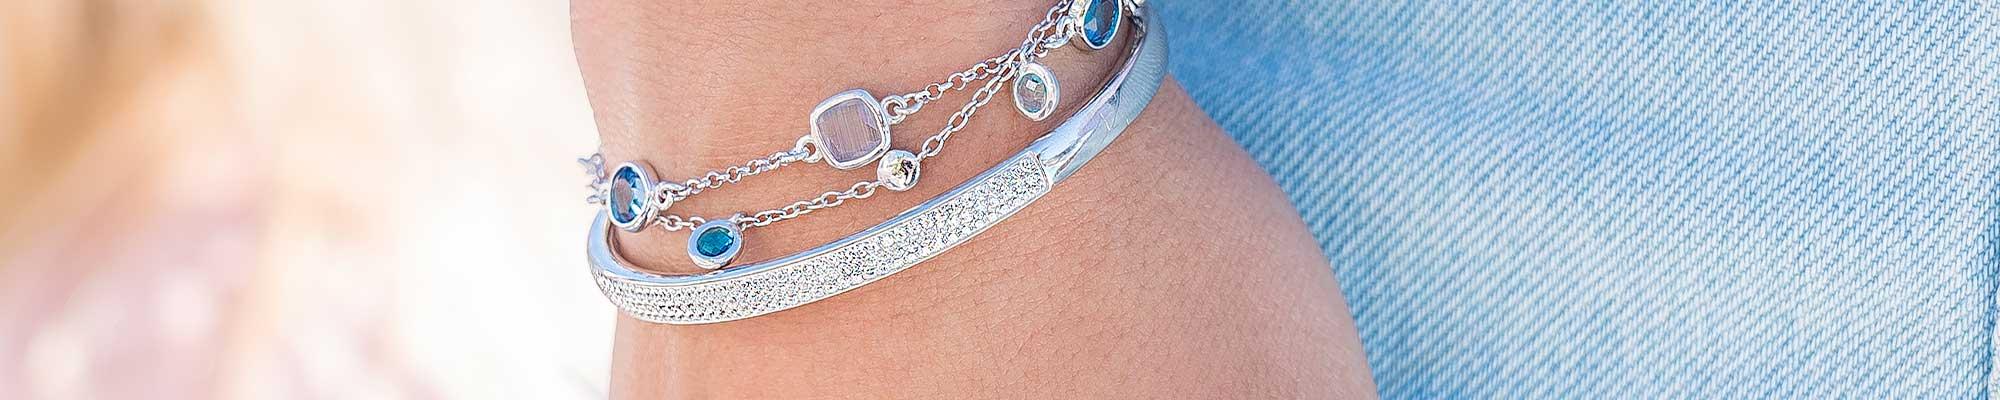 Bangle armband